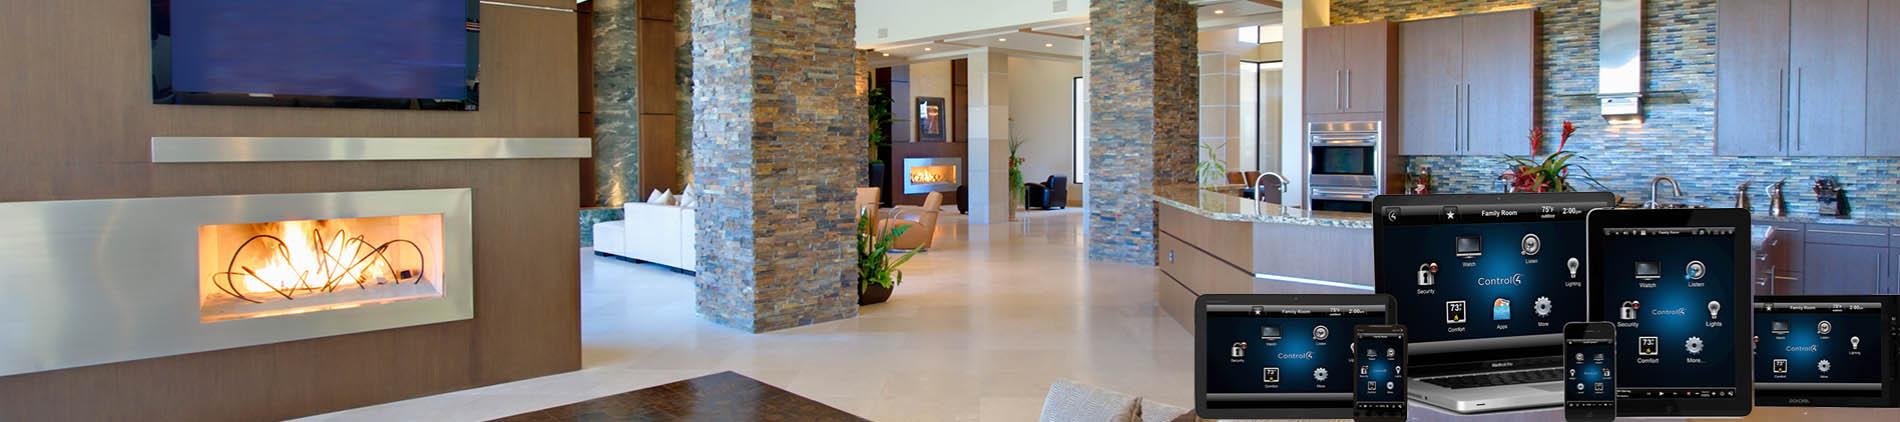 Smart Home Design EXPERTS